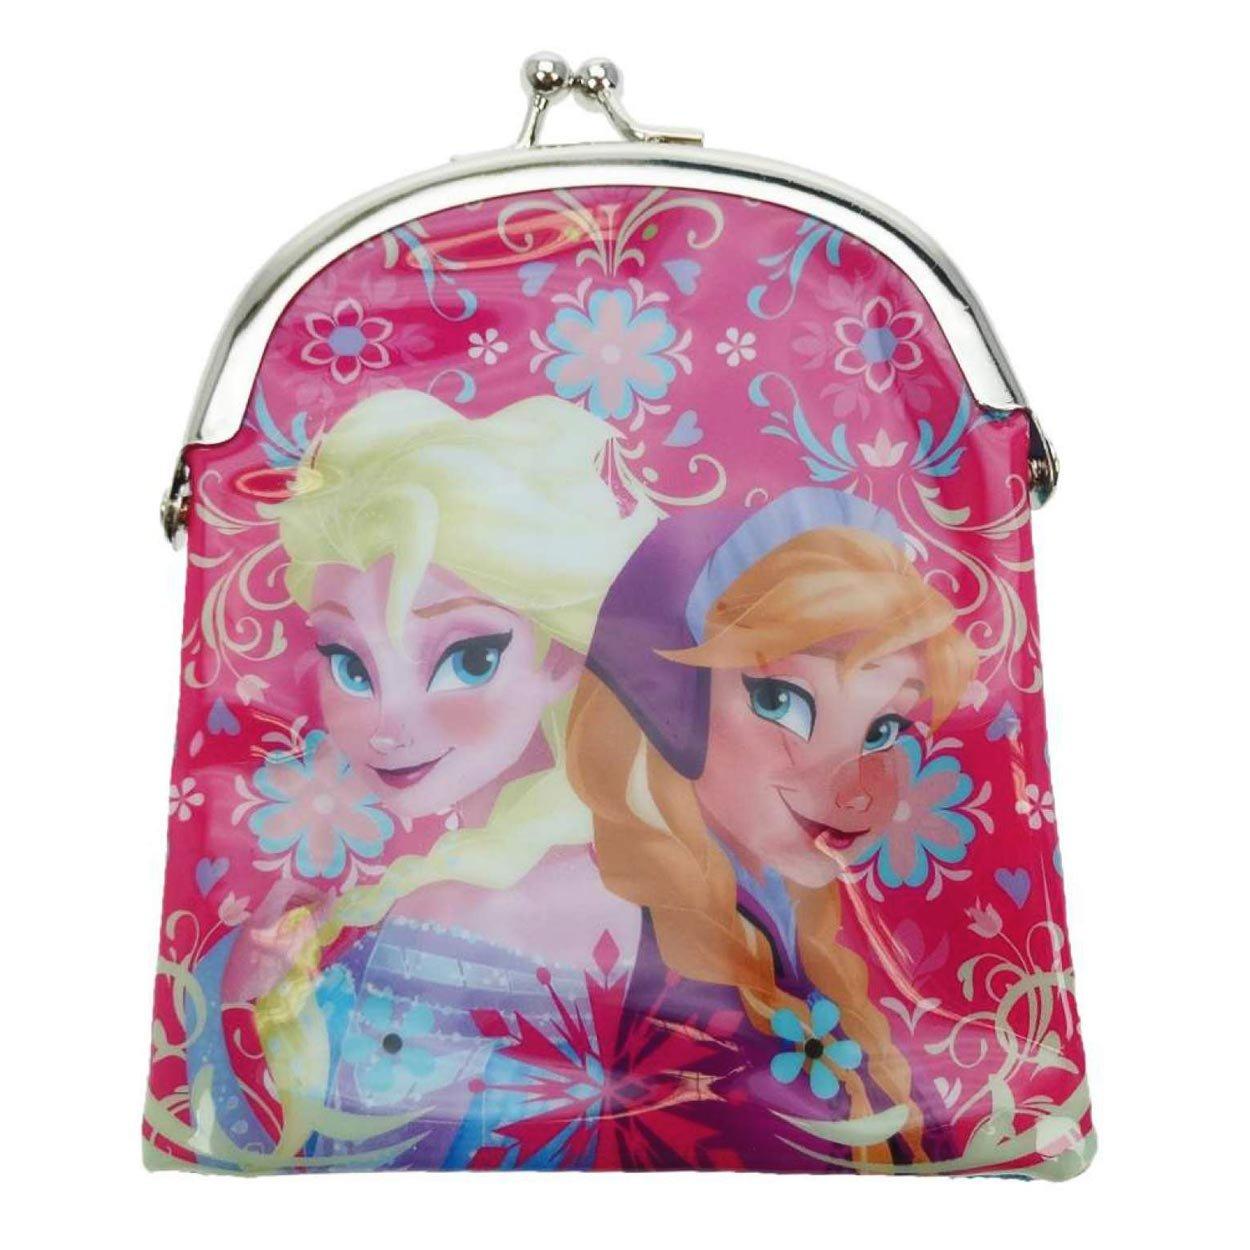 Disney Frozen Coin Pouch, Pink FROZEN004012